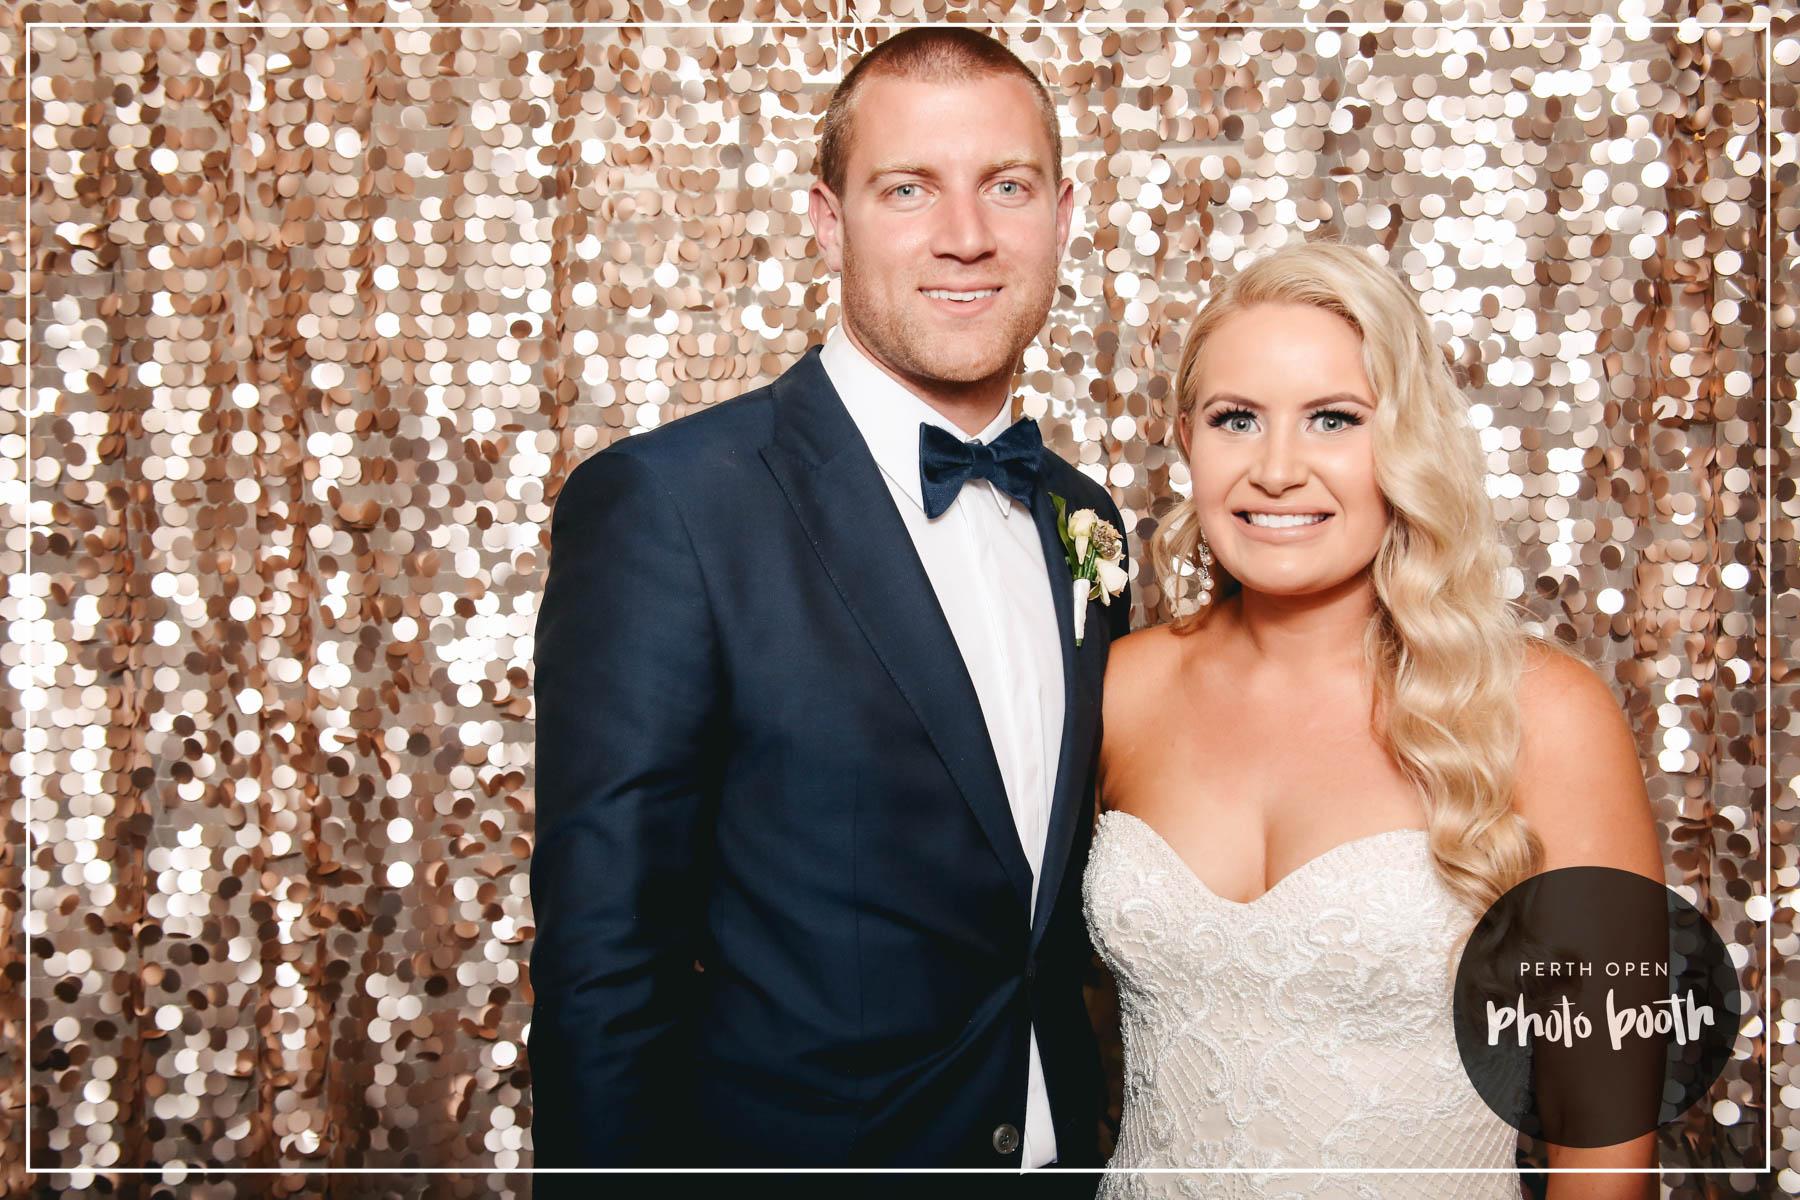 GEMMA & JASON'S WEDDING RECEPTION  PASSWORD: PROVIDED ON THE NIGHT - ALL LOWERCASE -